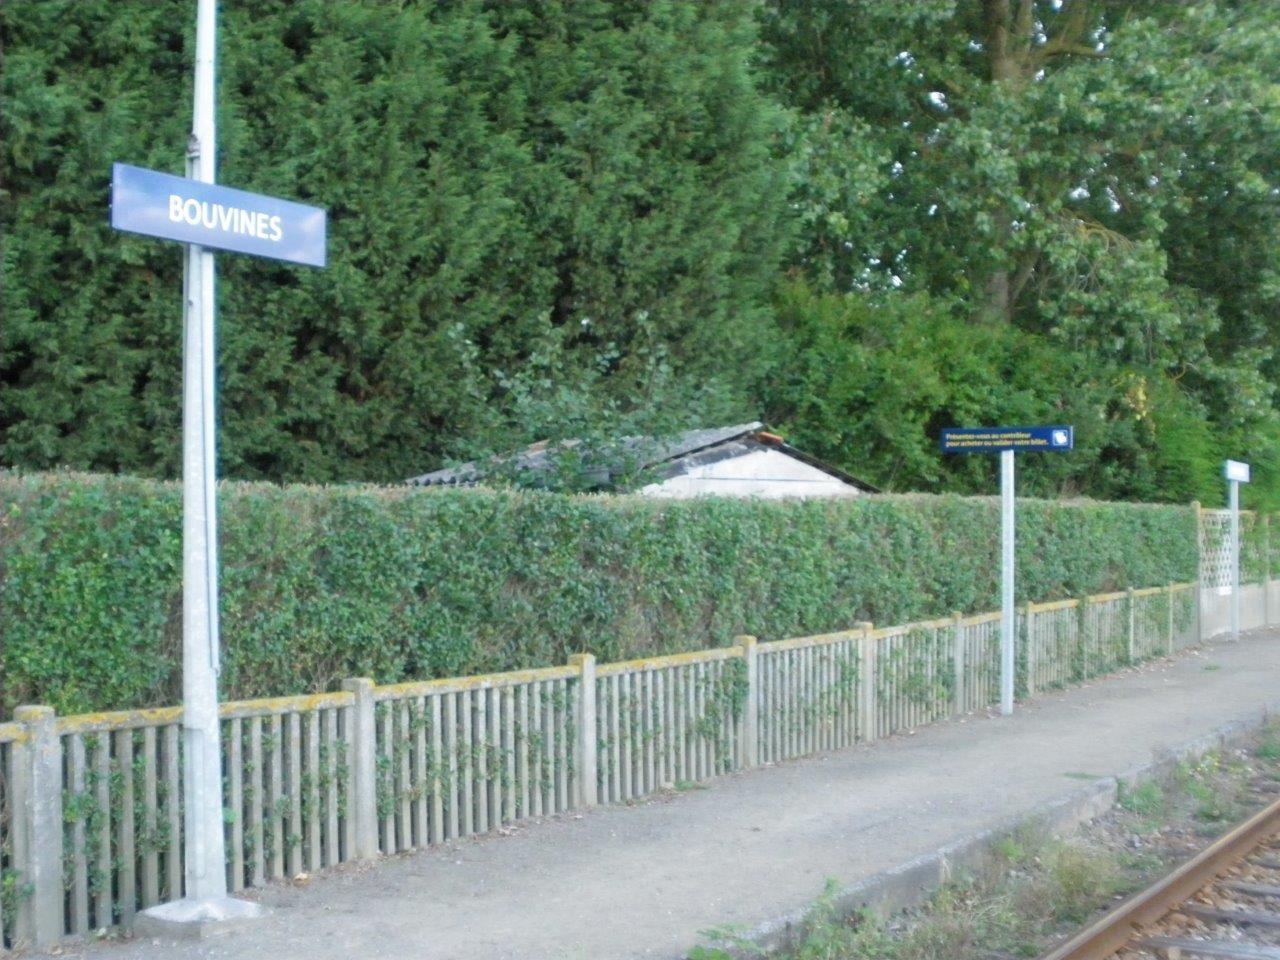 gare-de-bouvines-train-station